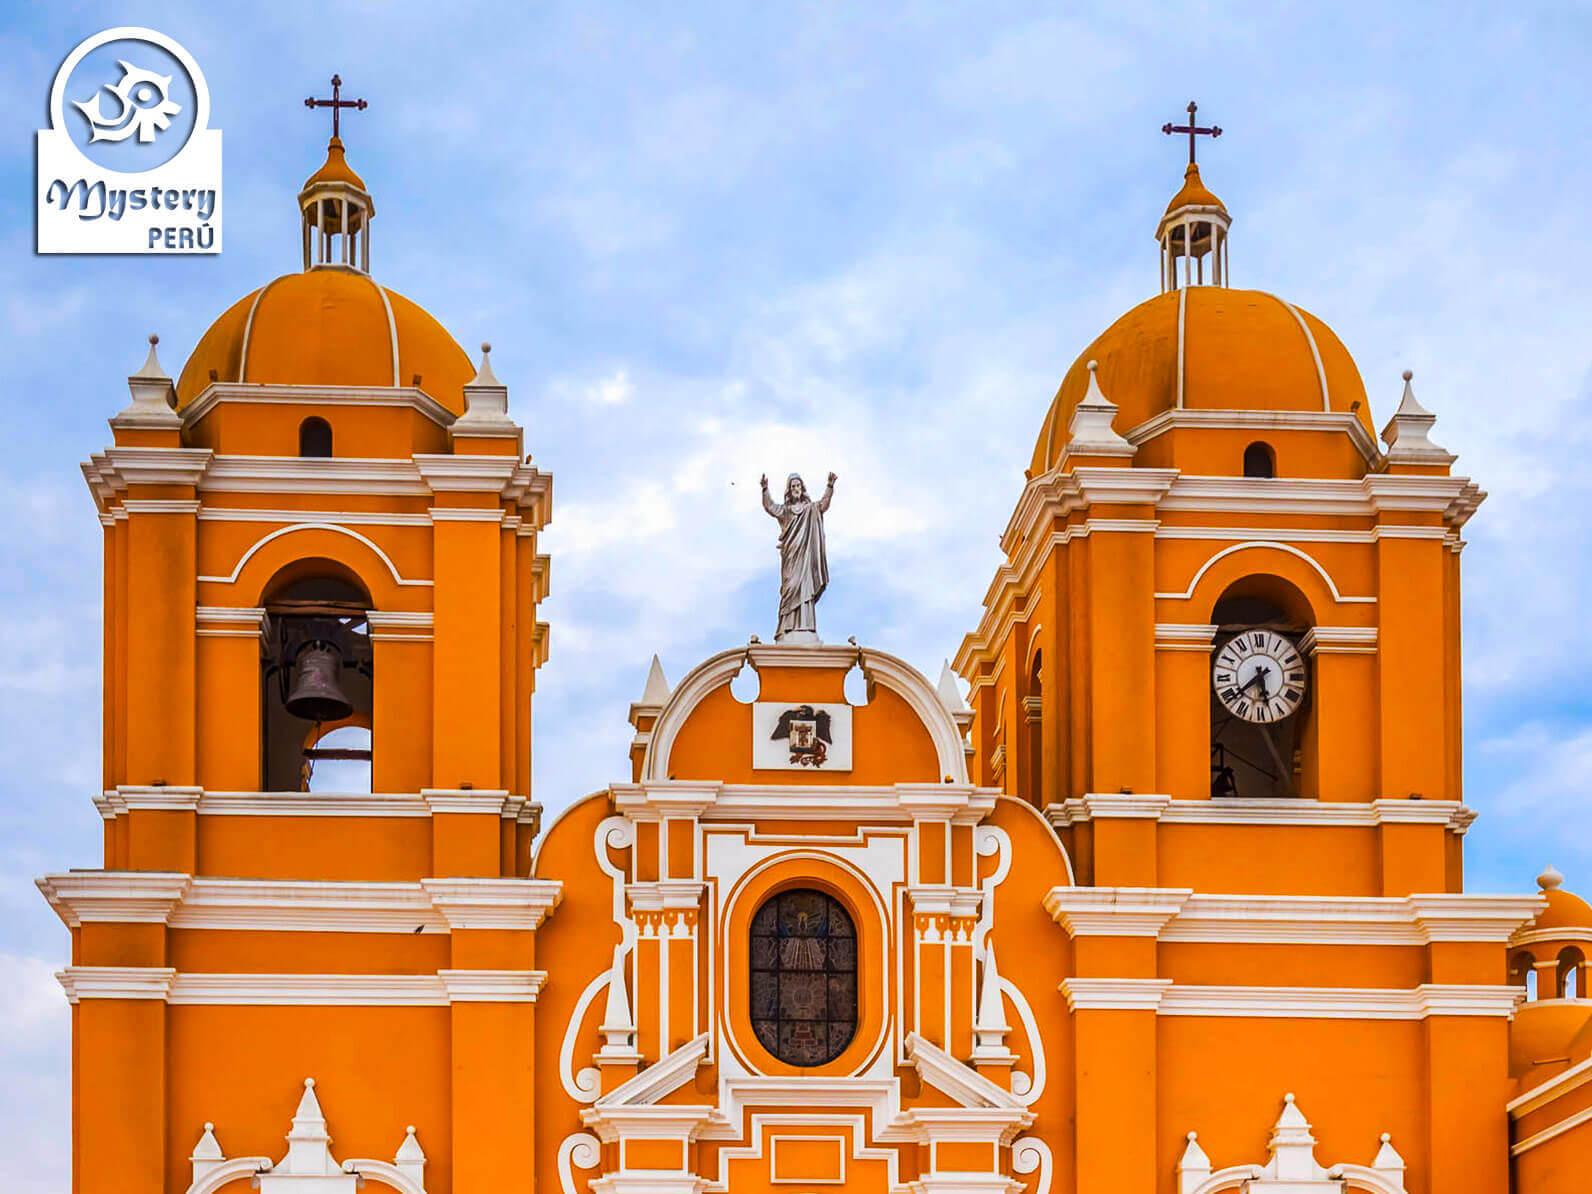 Cathedral of Trujillo in Peru.